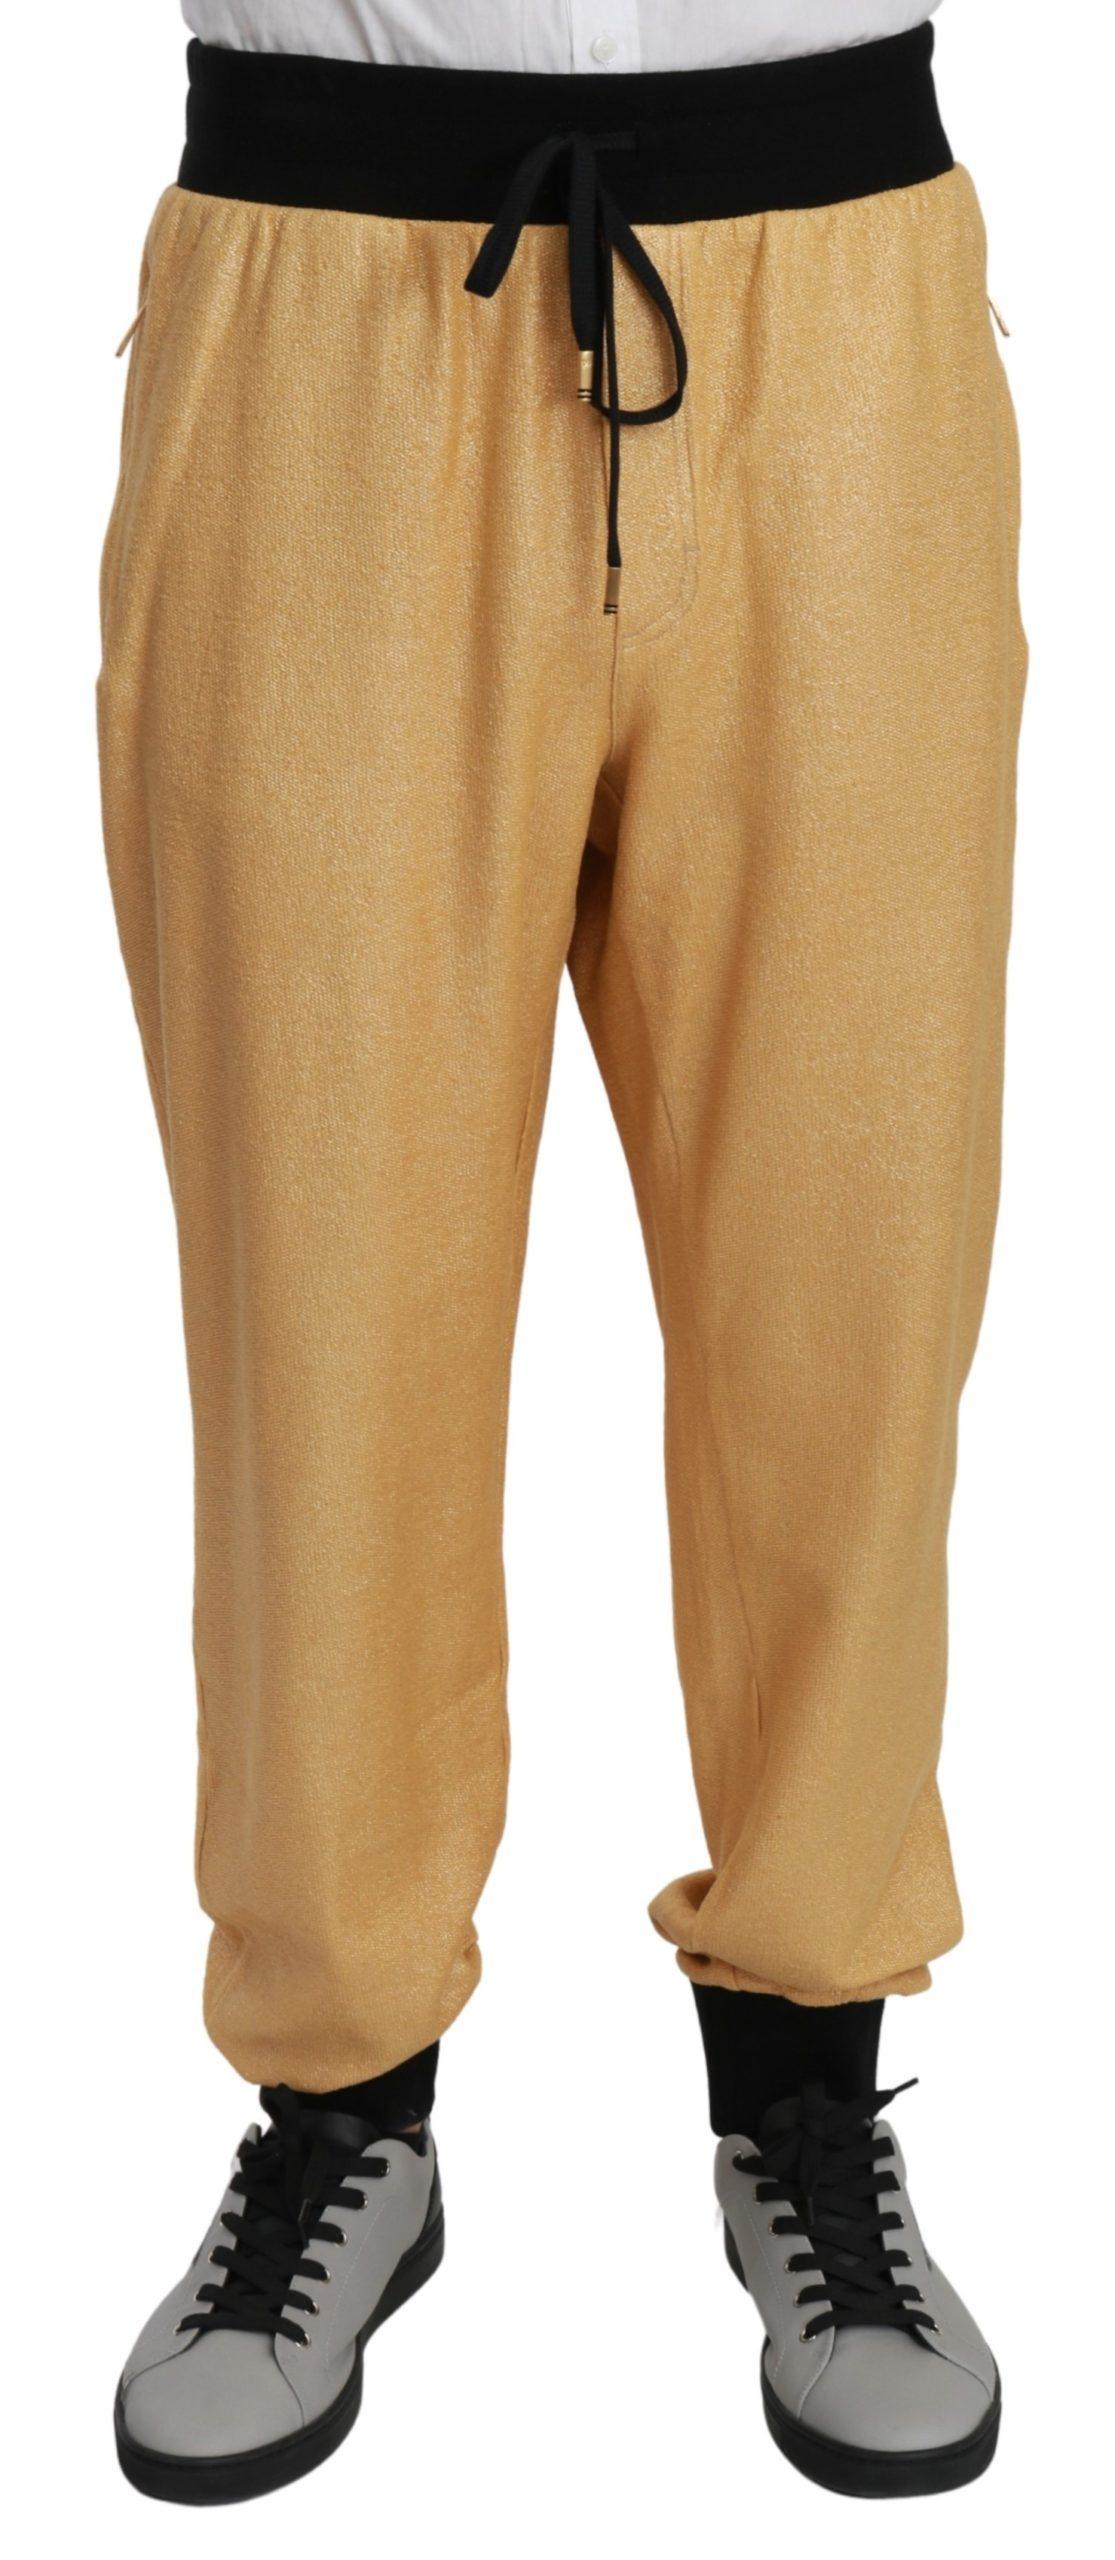 Dolce & Gabbana Men's Year Of The Pig Cotton Trouser Gold PAN70956 - IT56 | XXL